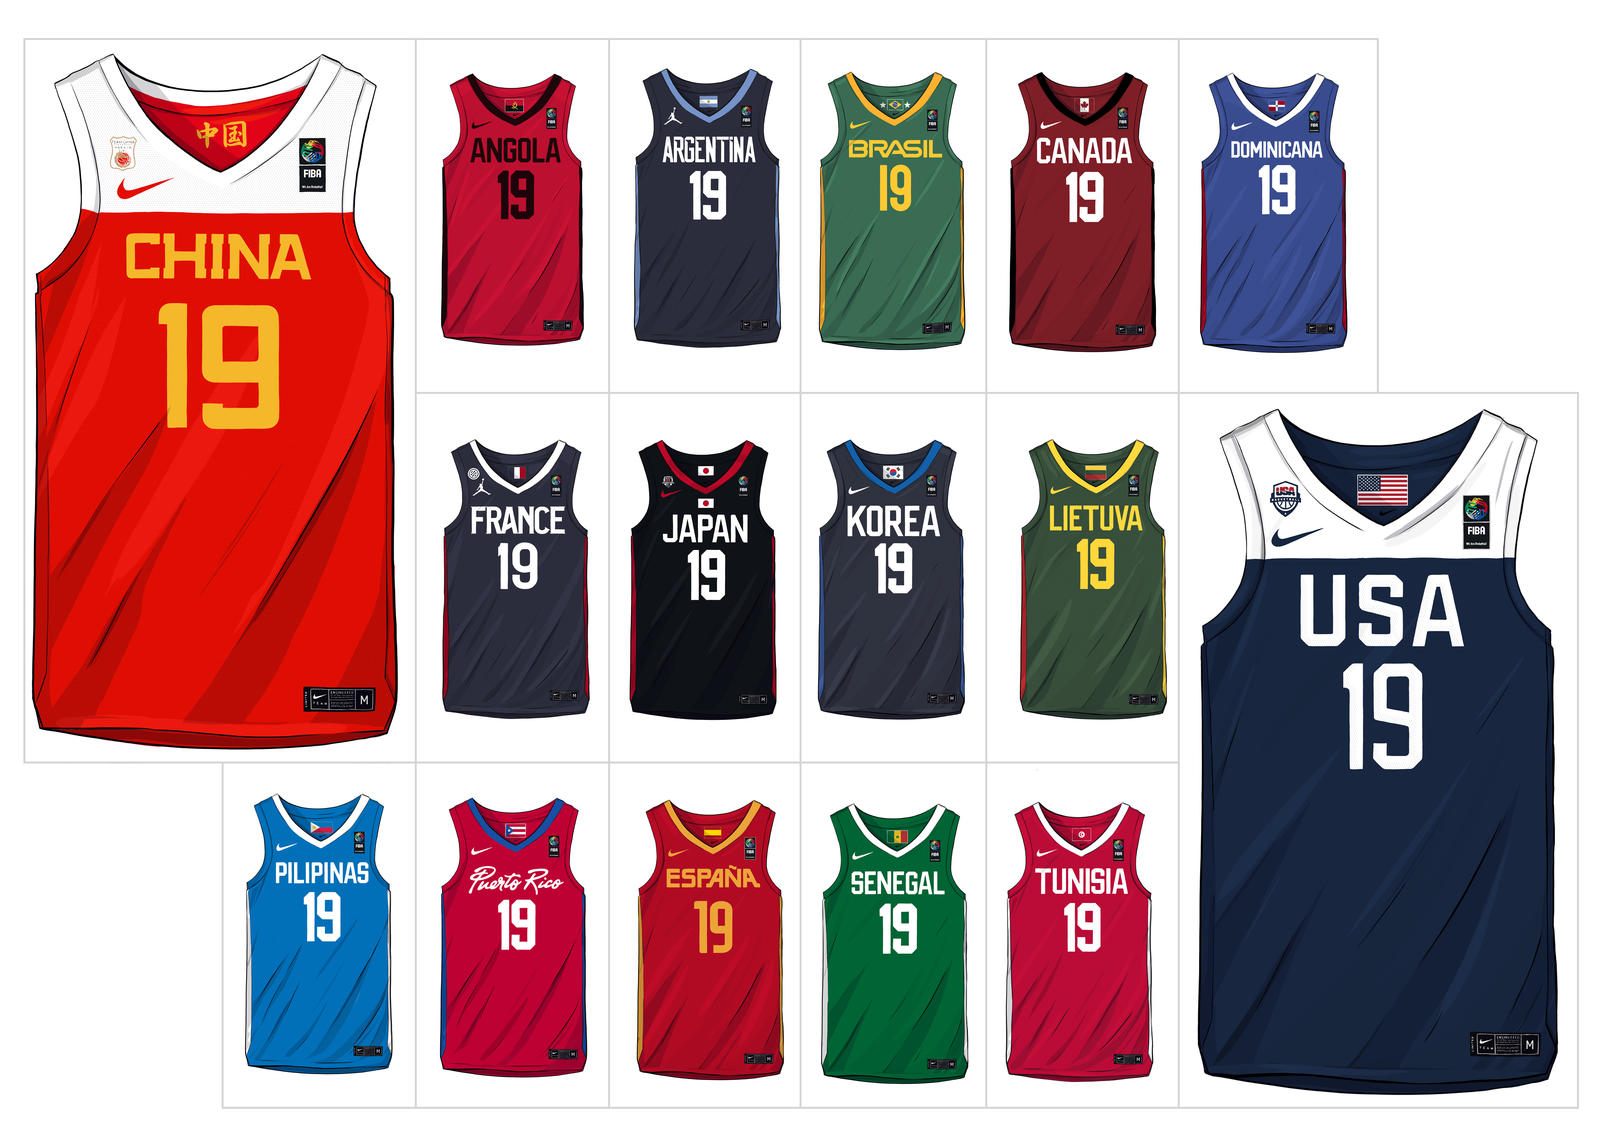 NikeNews_China2019BasketballUniforms_Composite_horizontalallv4_89689.jpg